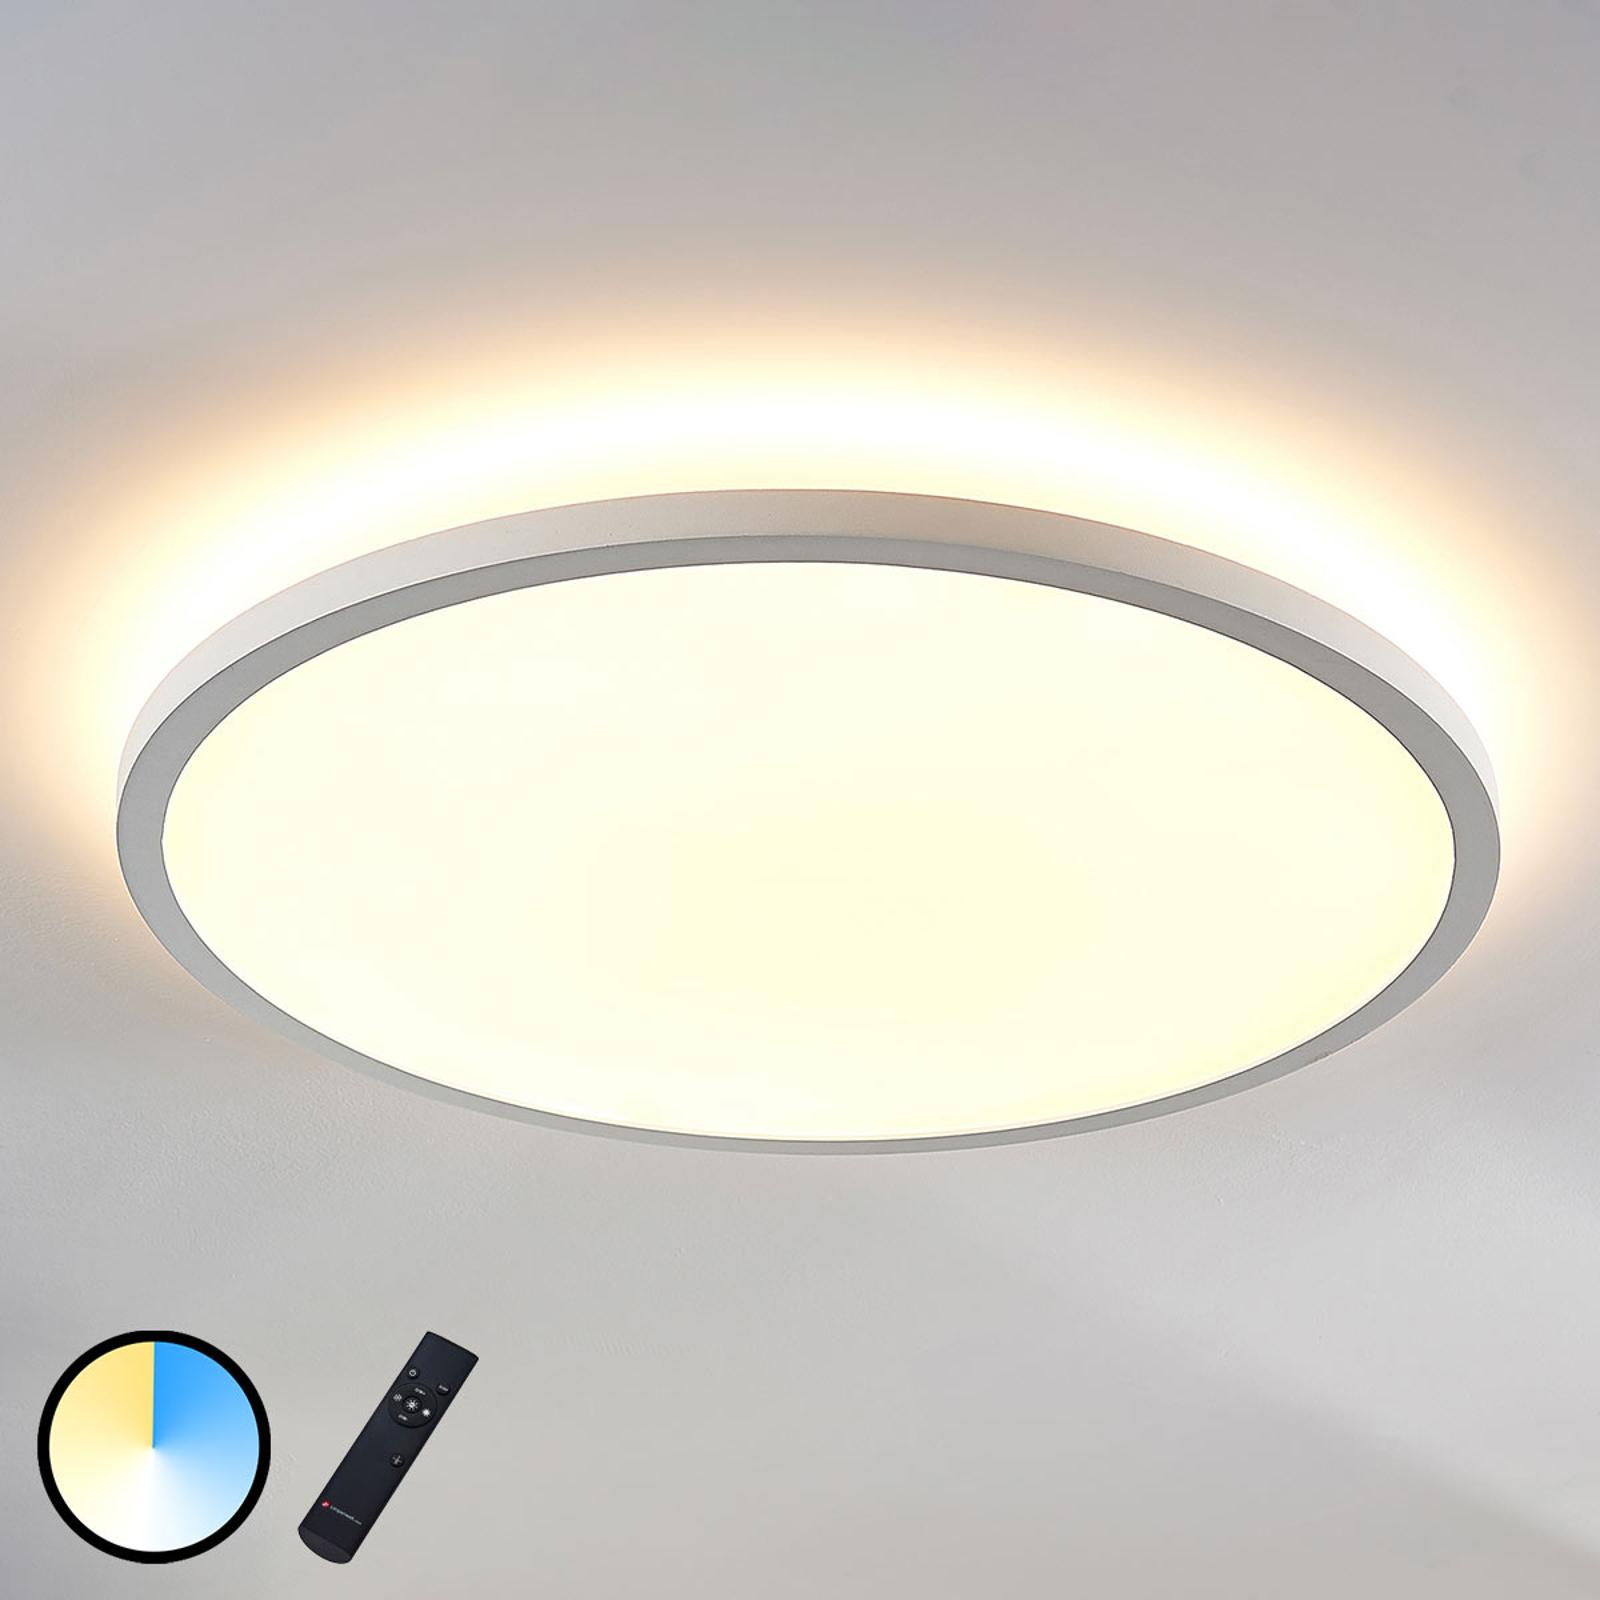 LED-panel Brenda CCT, fjernbetjening, Ø 60cm